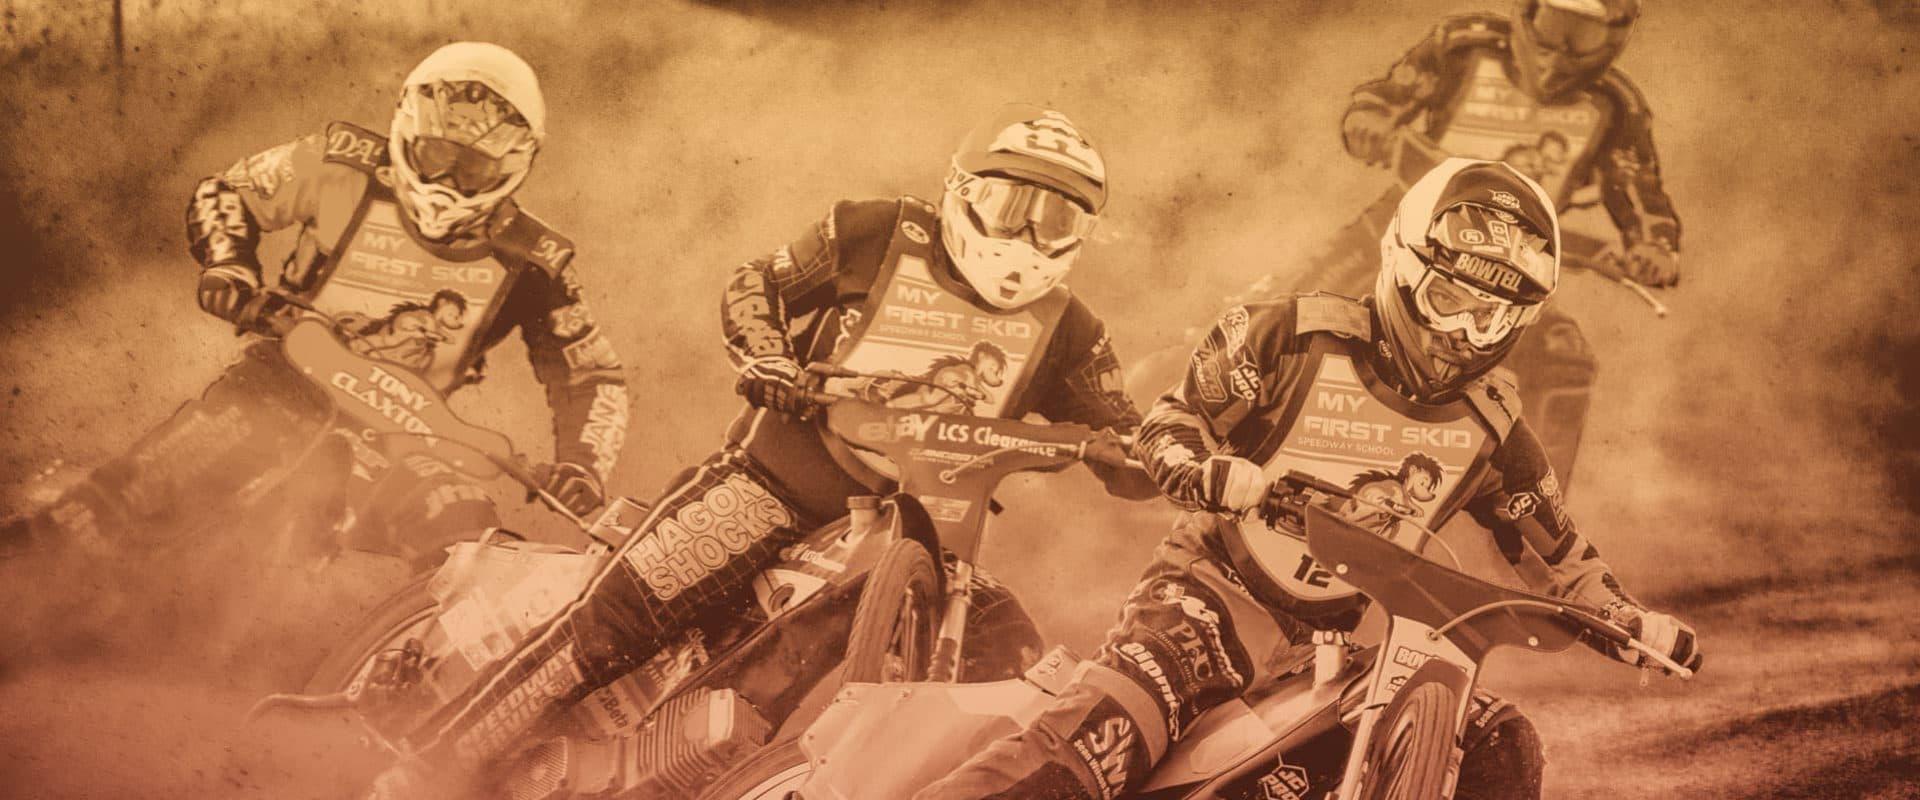 Nordjysk Elite Speedway